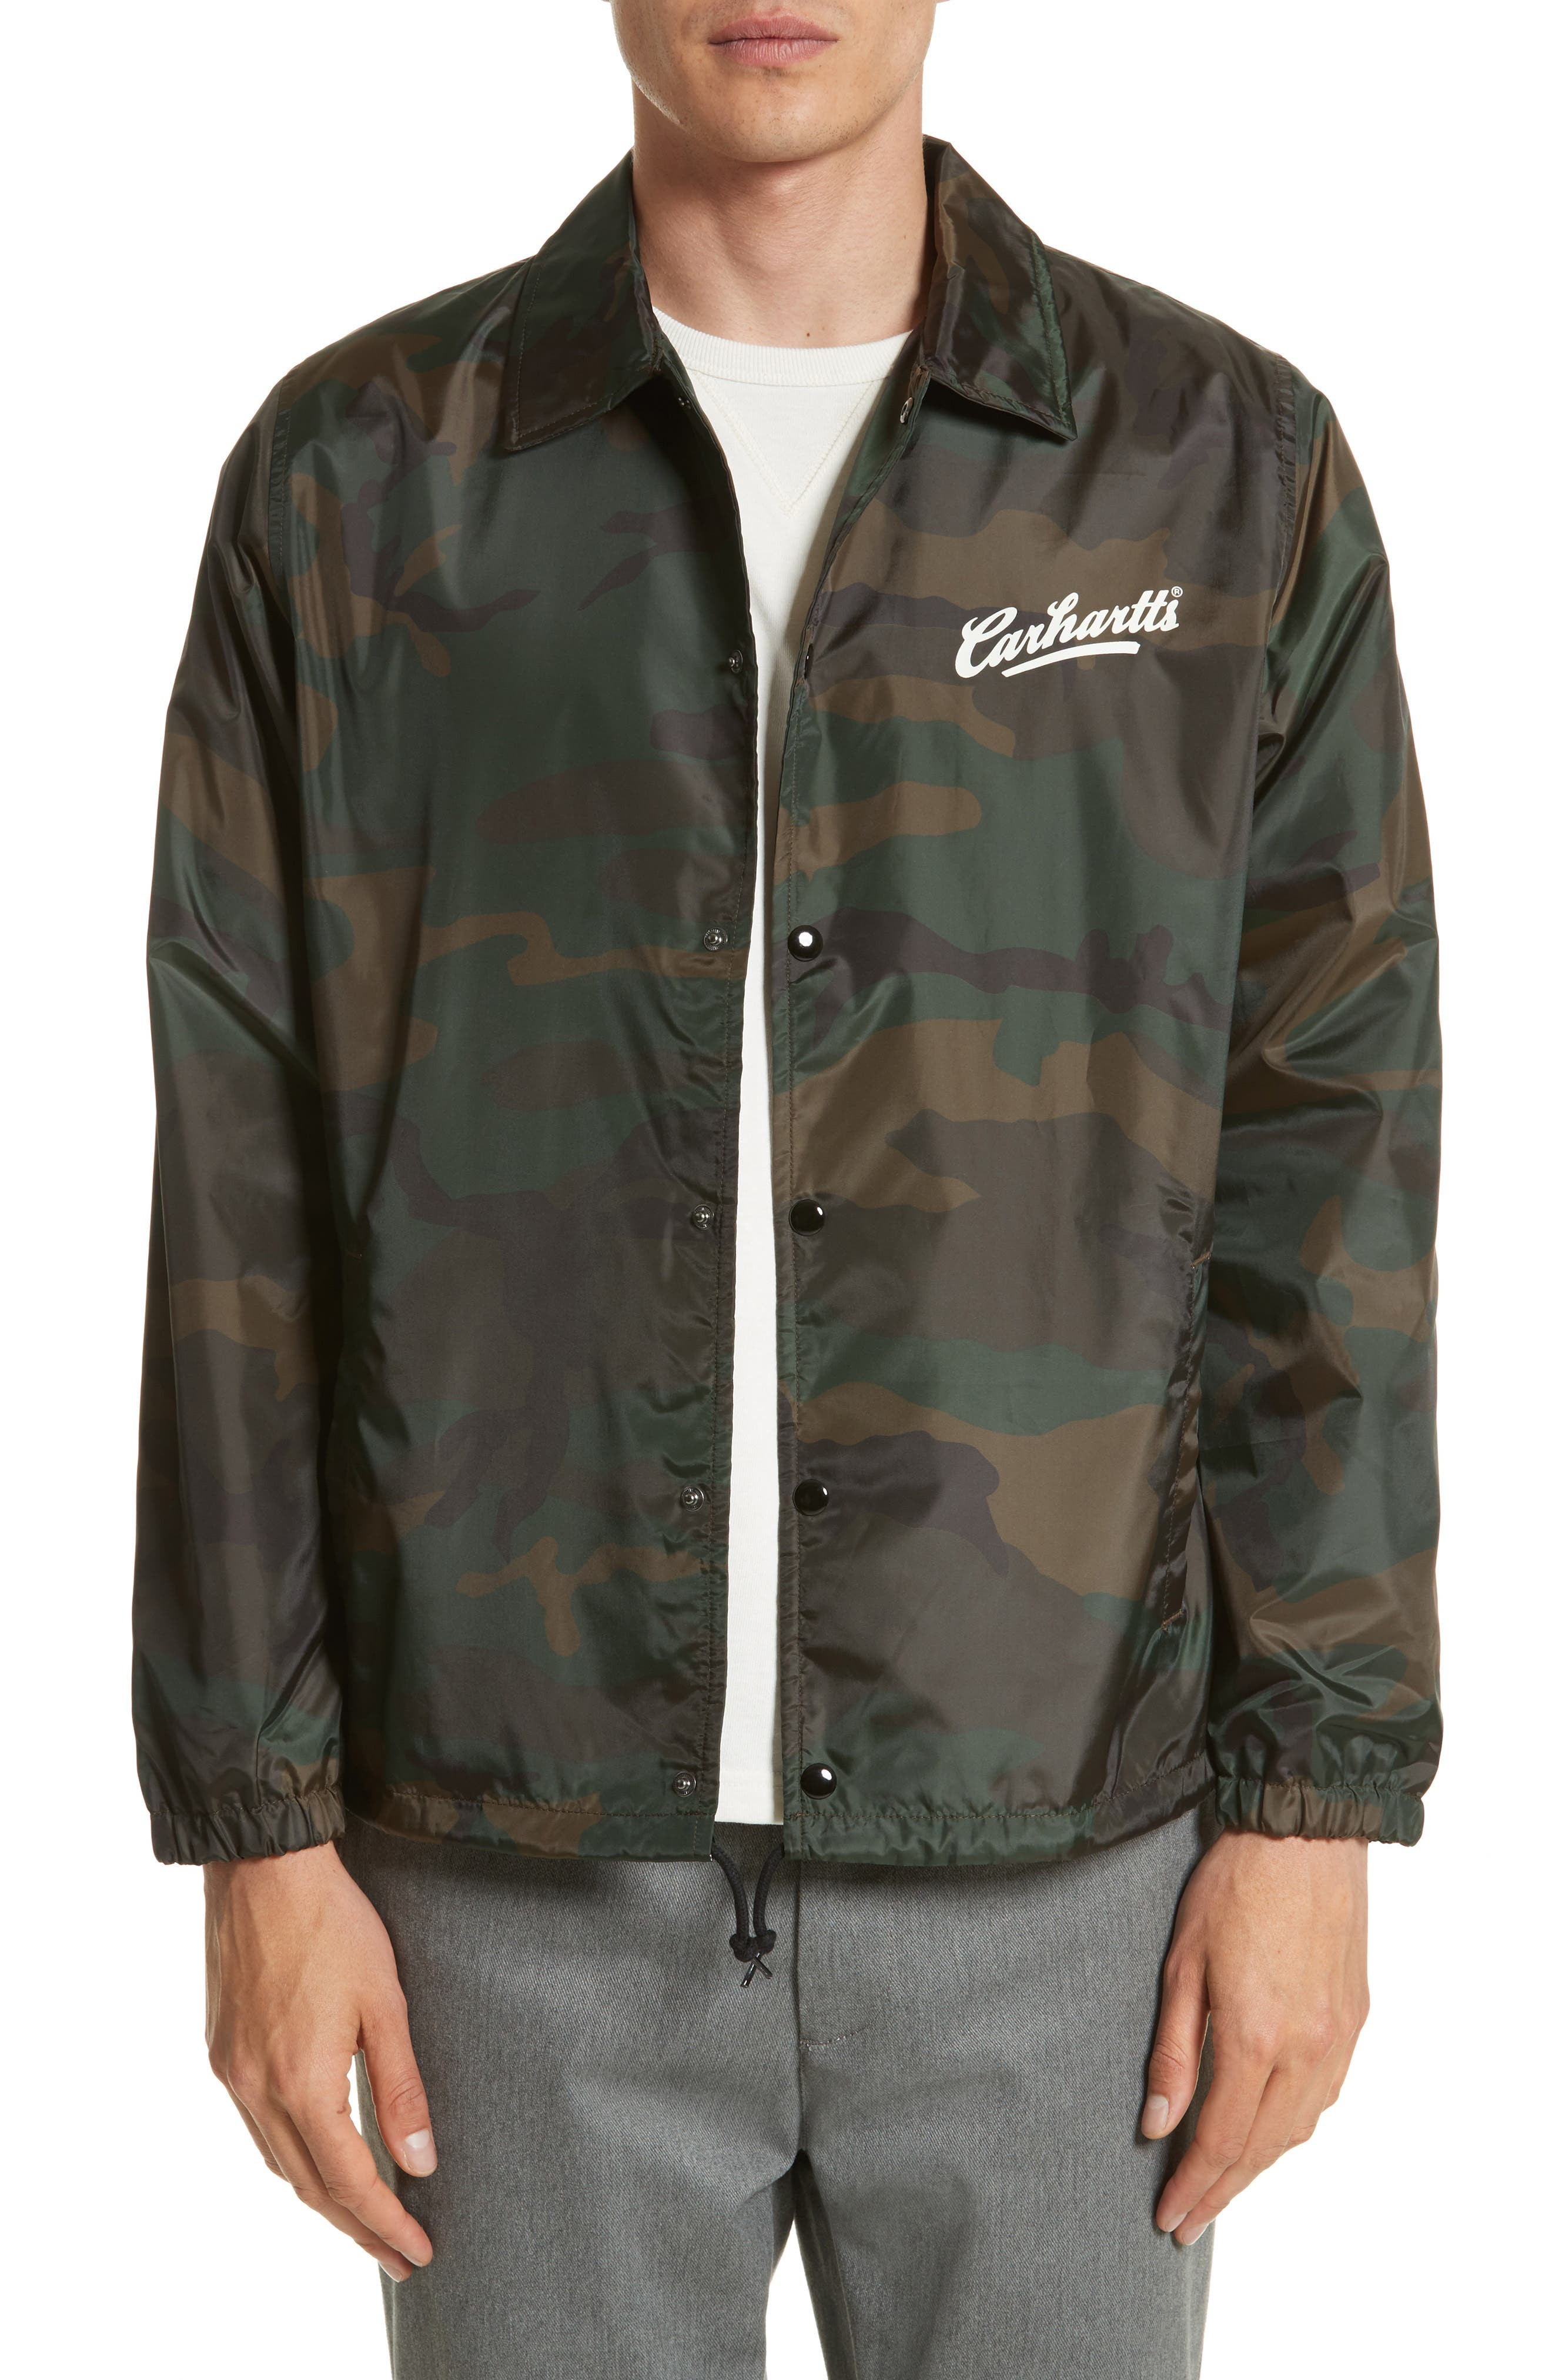 Camo Print Coach Jacket,                             Main thumbnail 1, color,                             Camo Combat Green/White